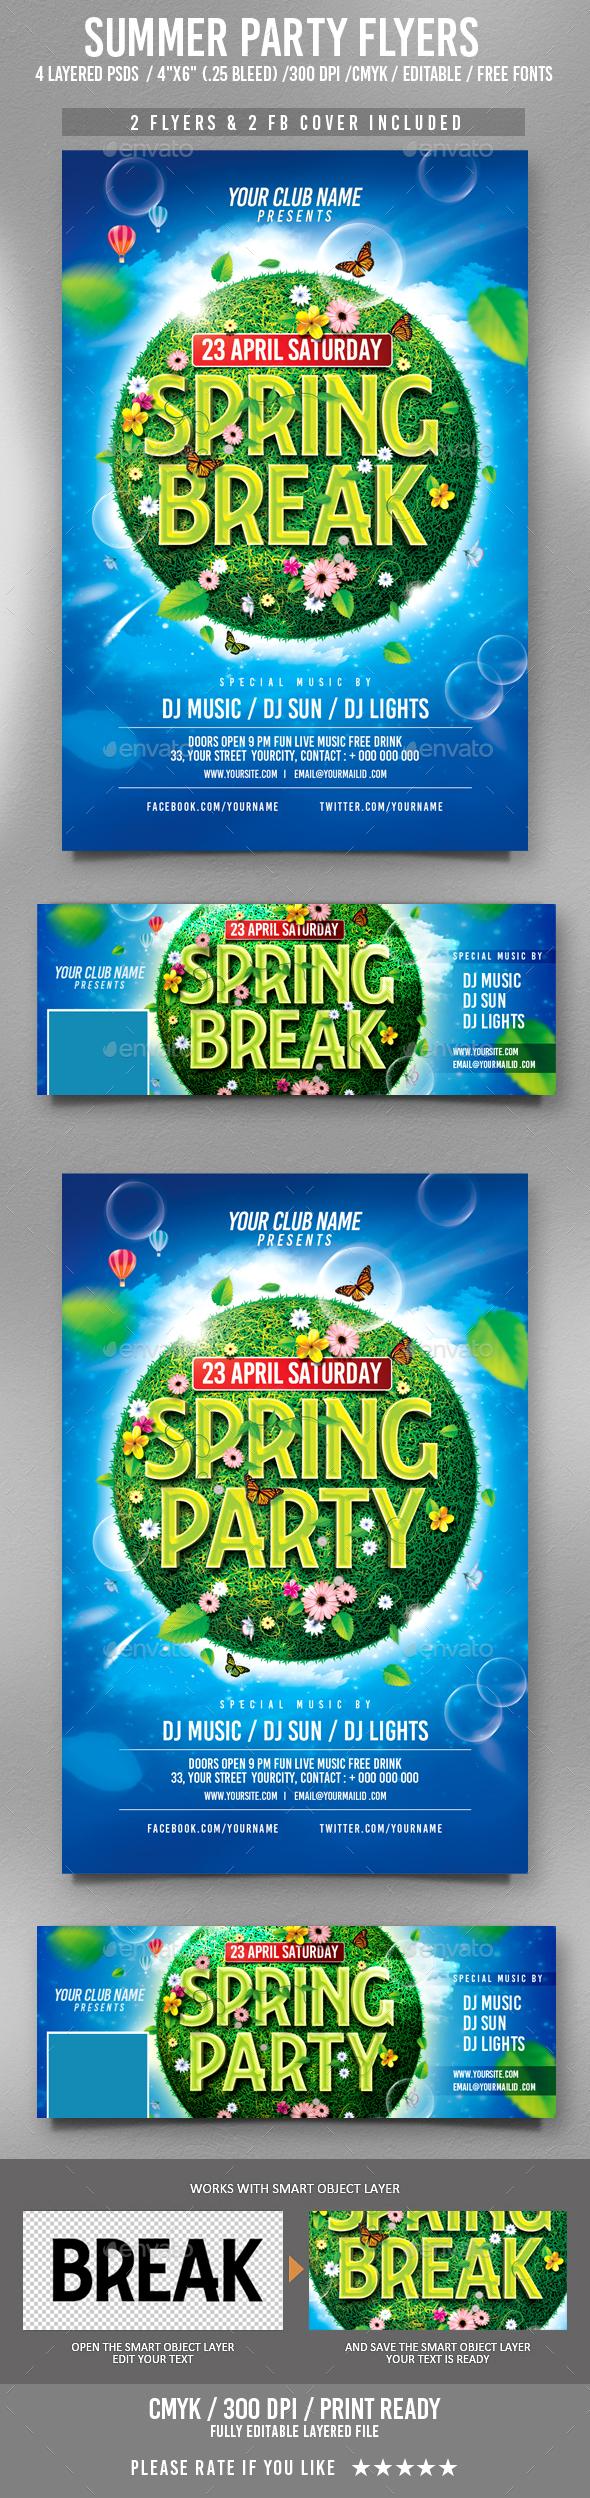 Spring Break Flyer - Clubs & Parties Events